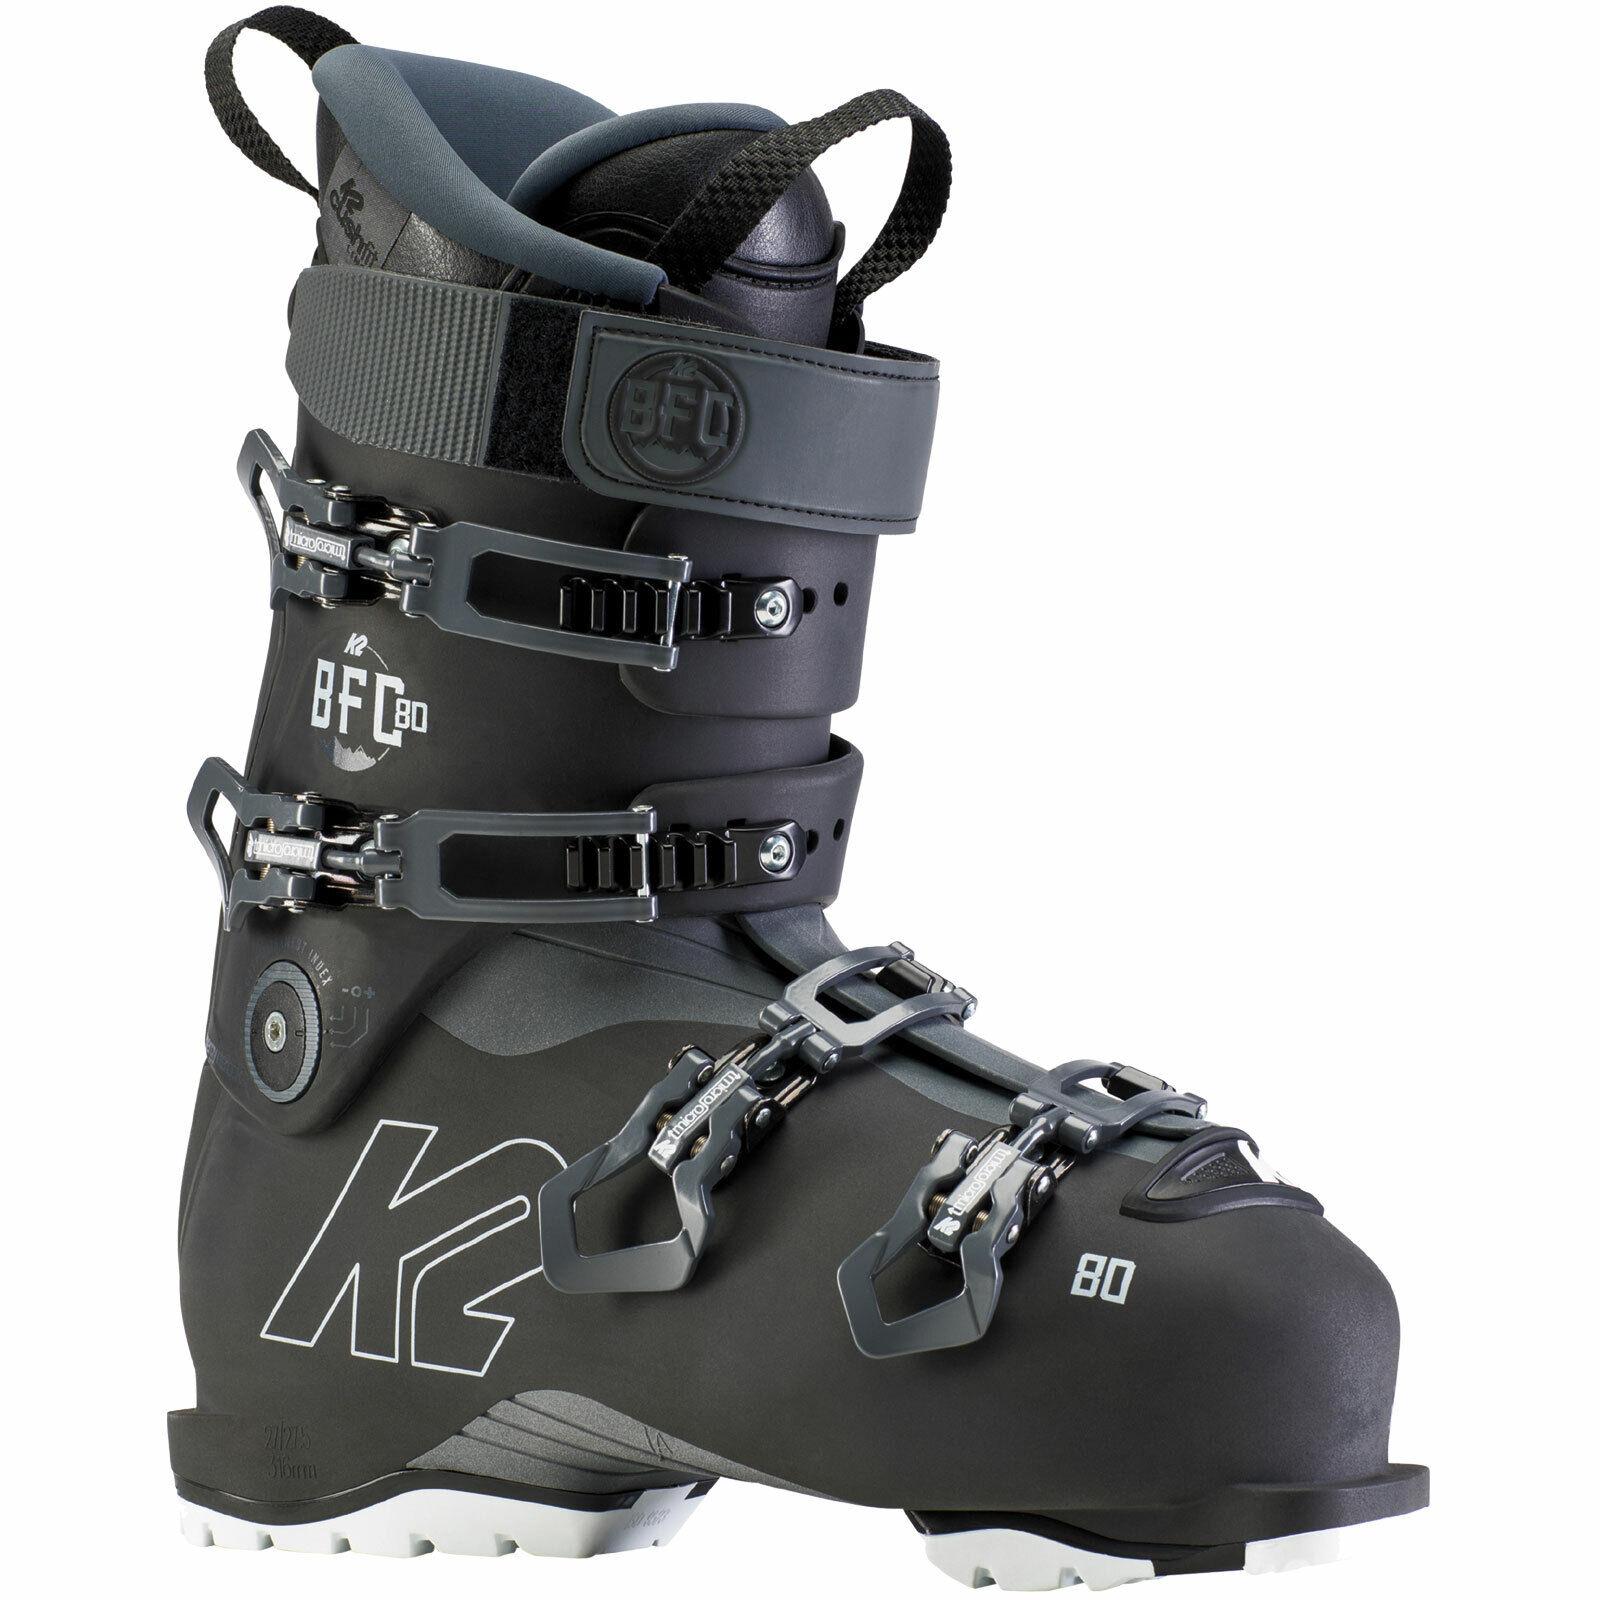 K2 Bfc 80 uomoSkistivali Sautoponi da Sci Skistivali tutti Mountain Mountain Mountain Alpino 81b